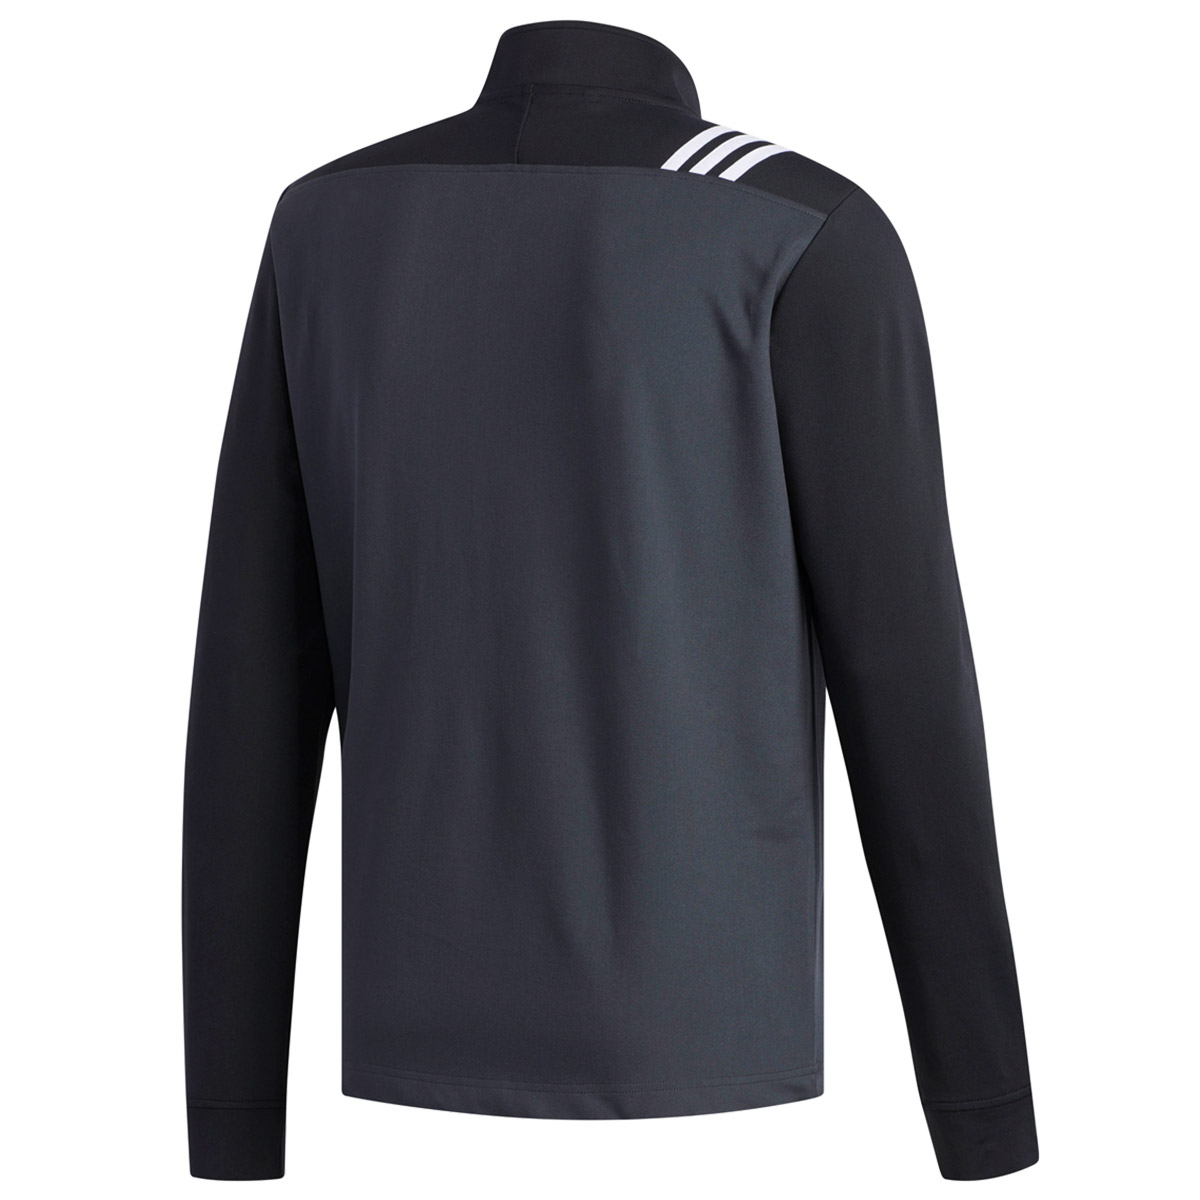 13b7b7e3f685 adidas Golf 3-Stripe Block Jacket from american golf